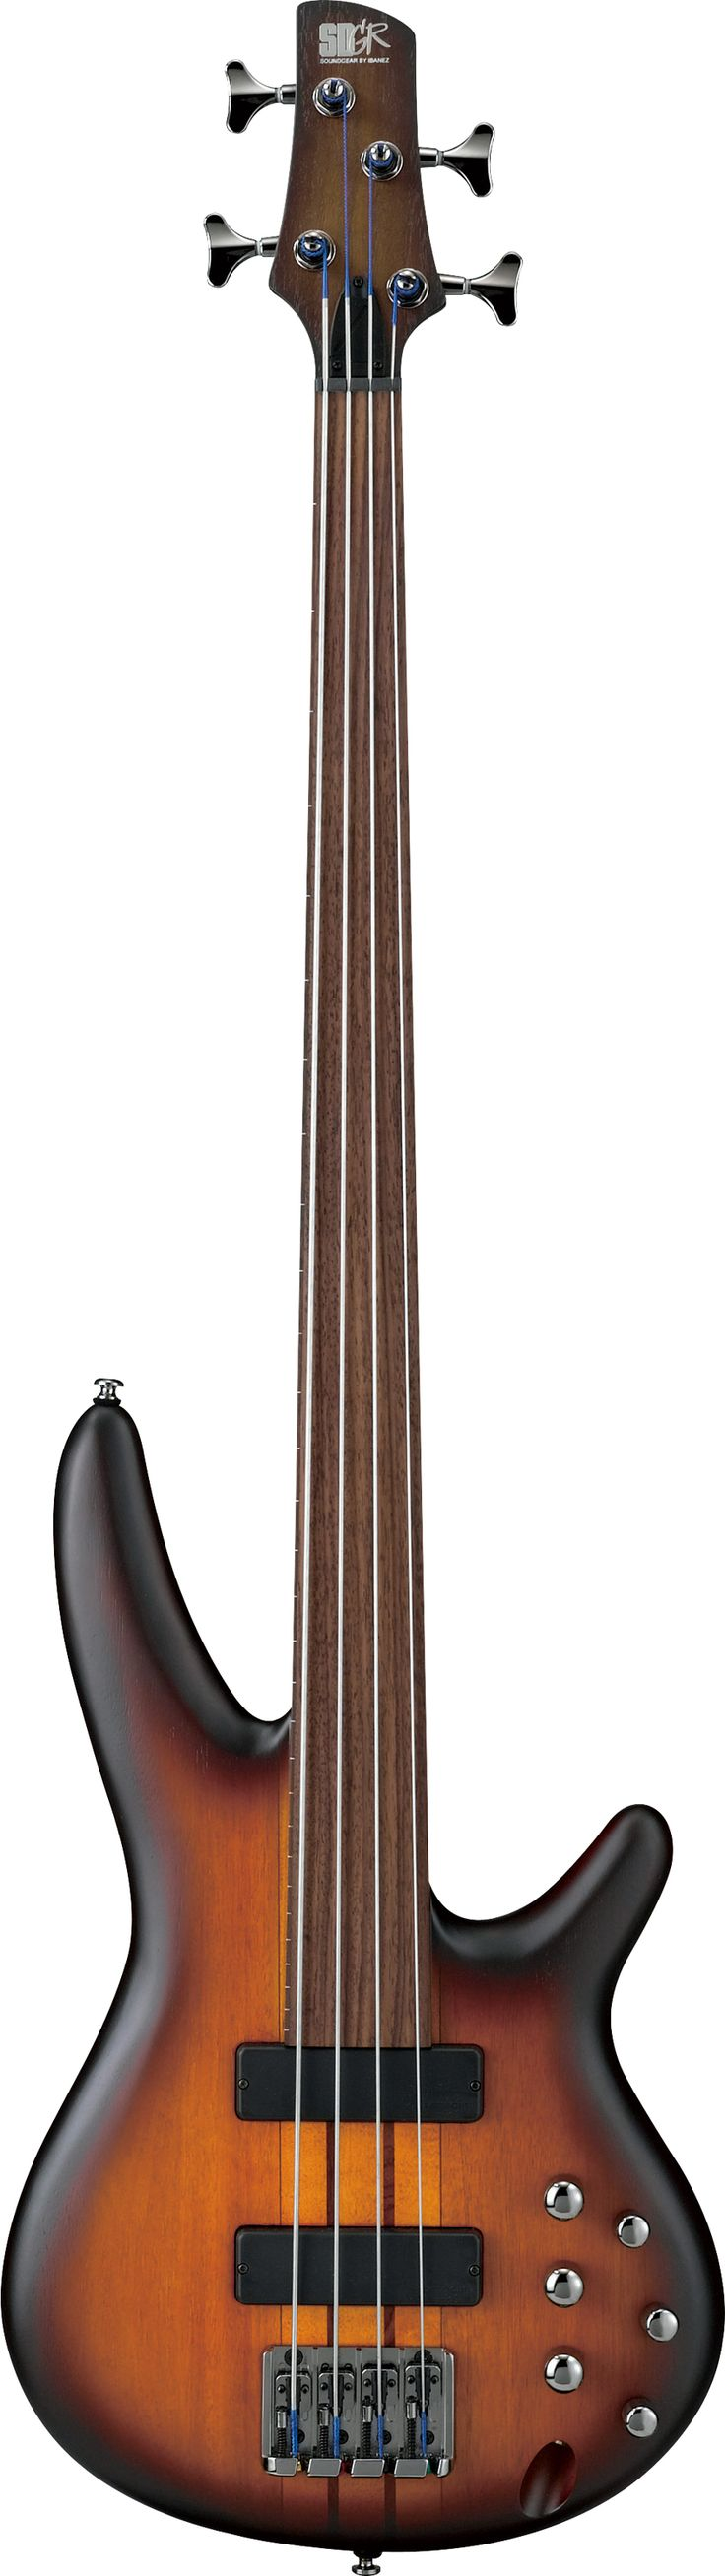 Ibanez SRF700BBF Workshop Fretless Bass Guitar Brown Burst Flat